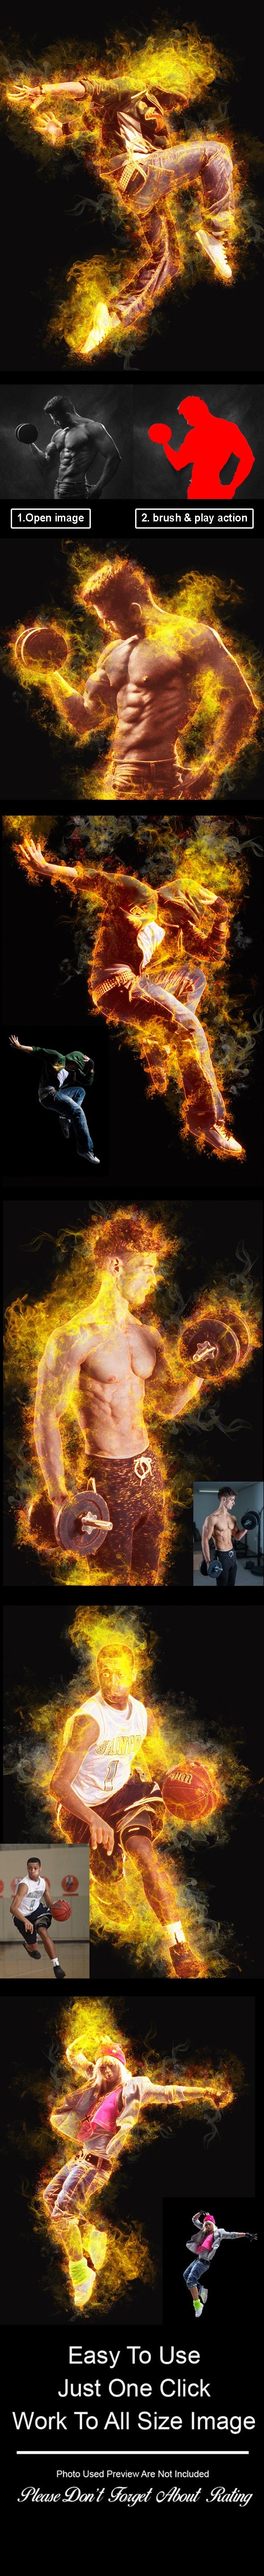 Amazing Flame Photoshop Action Vol 2 - Actions Photoshop